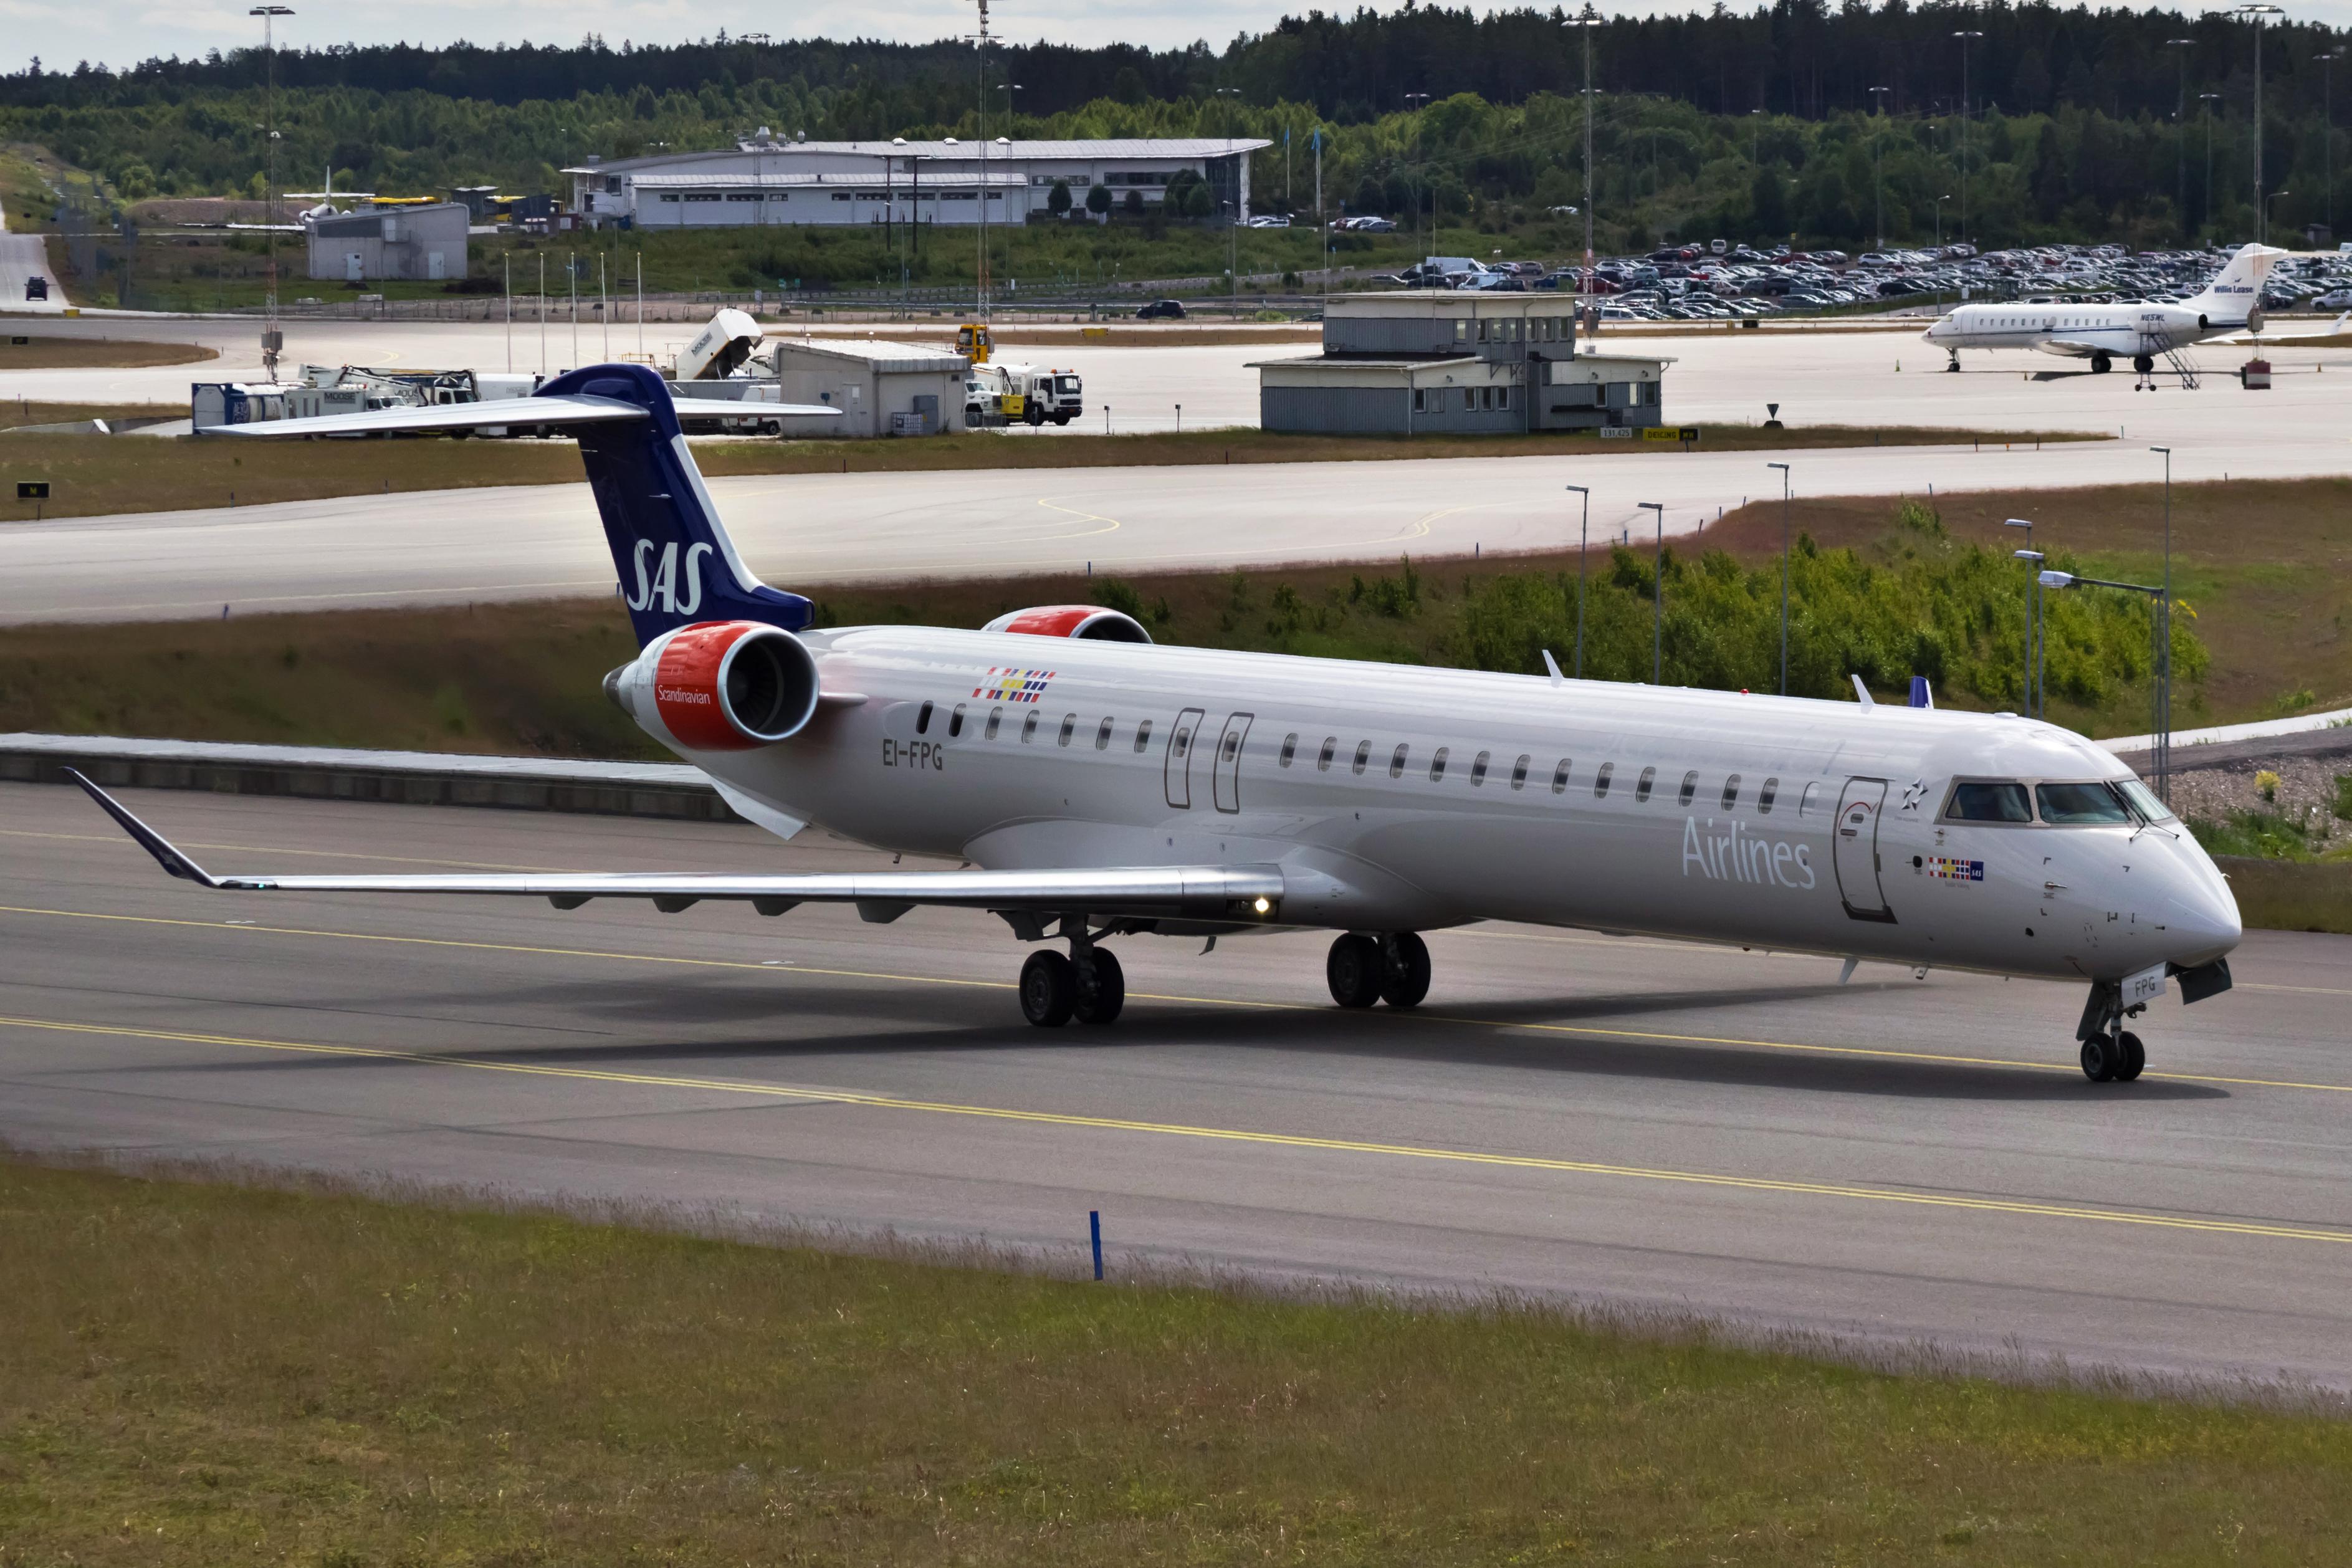 Bombardier CRJ900-fly fra CityJet (EI-FPG) i SAS-farver i Stockholm-Arlanda. (Foto: Bene Riobó)